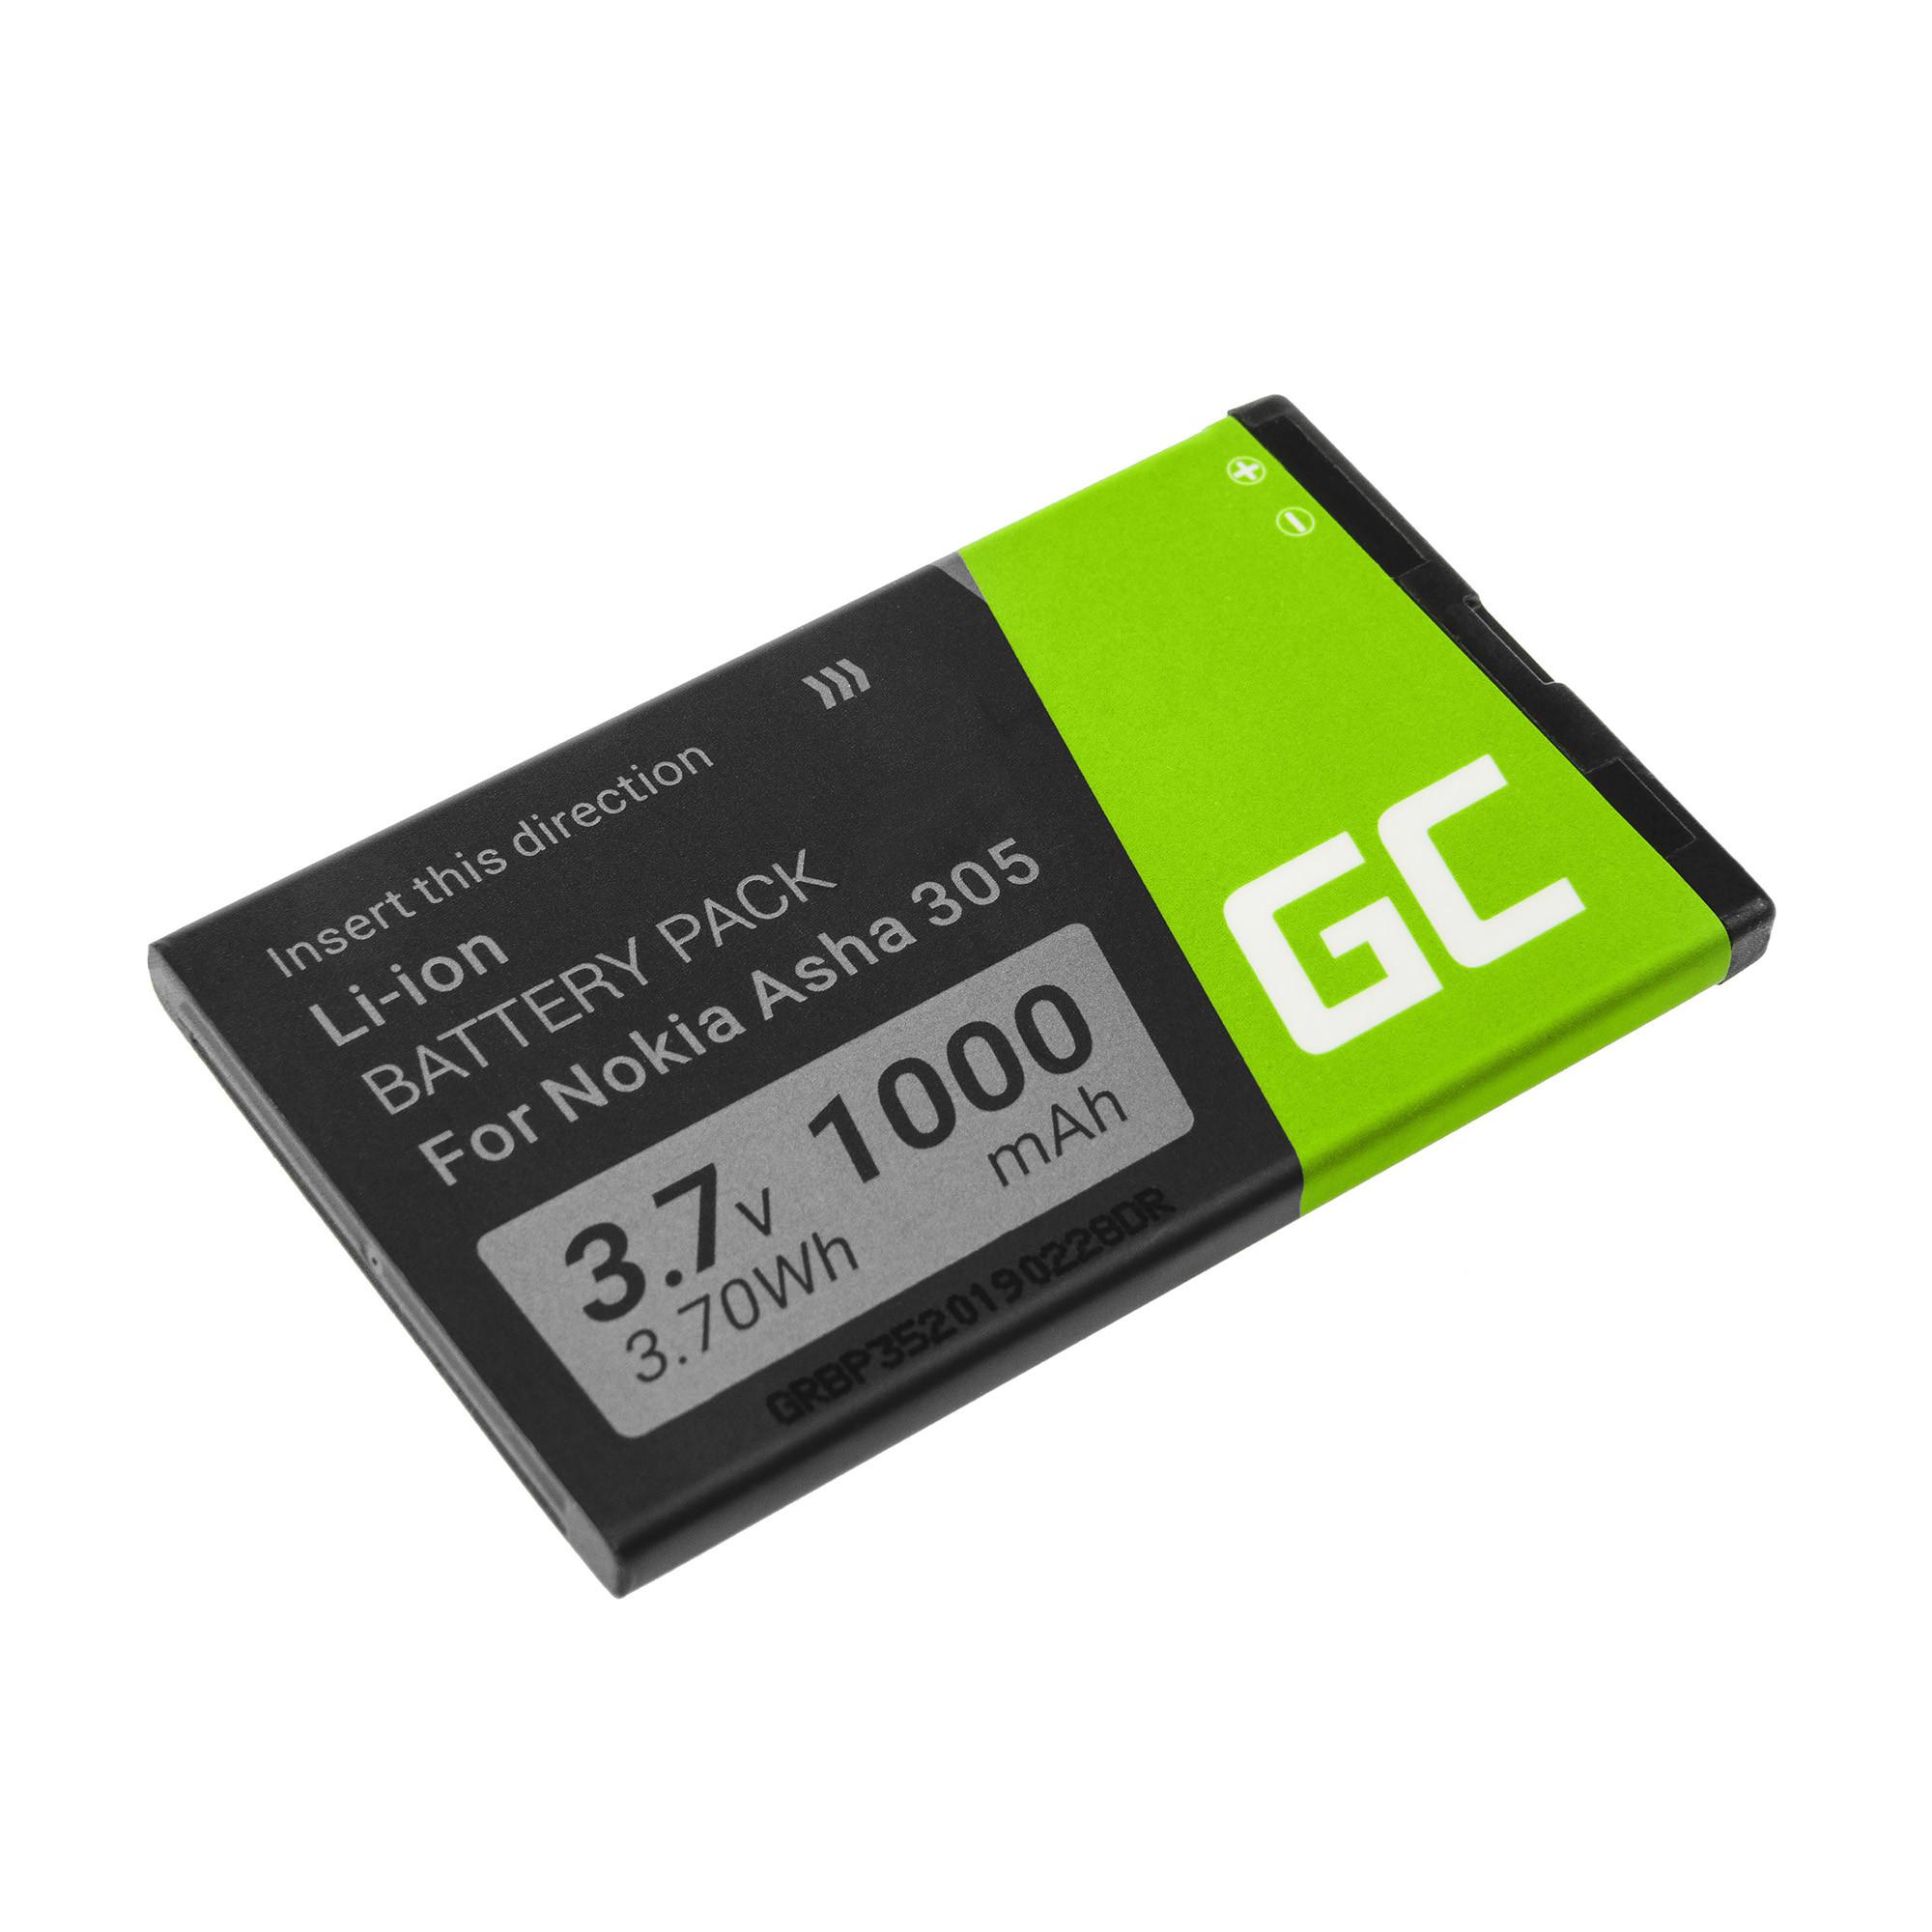 Baterie Green Cell Nokia BL-4U BL4U 1000mAh Li-ion - neoriginální